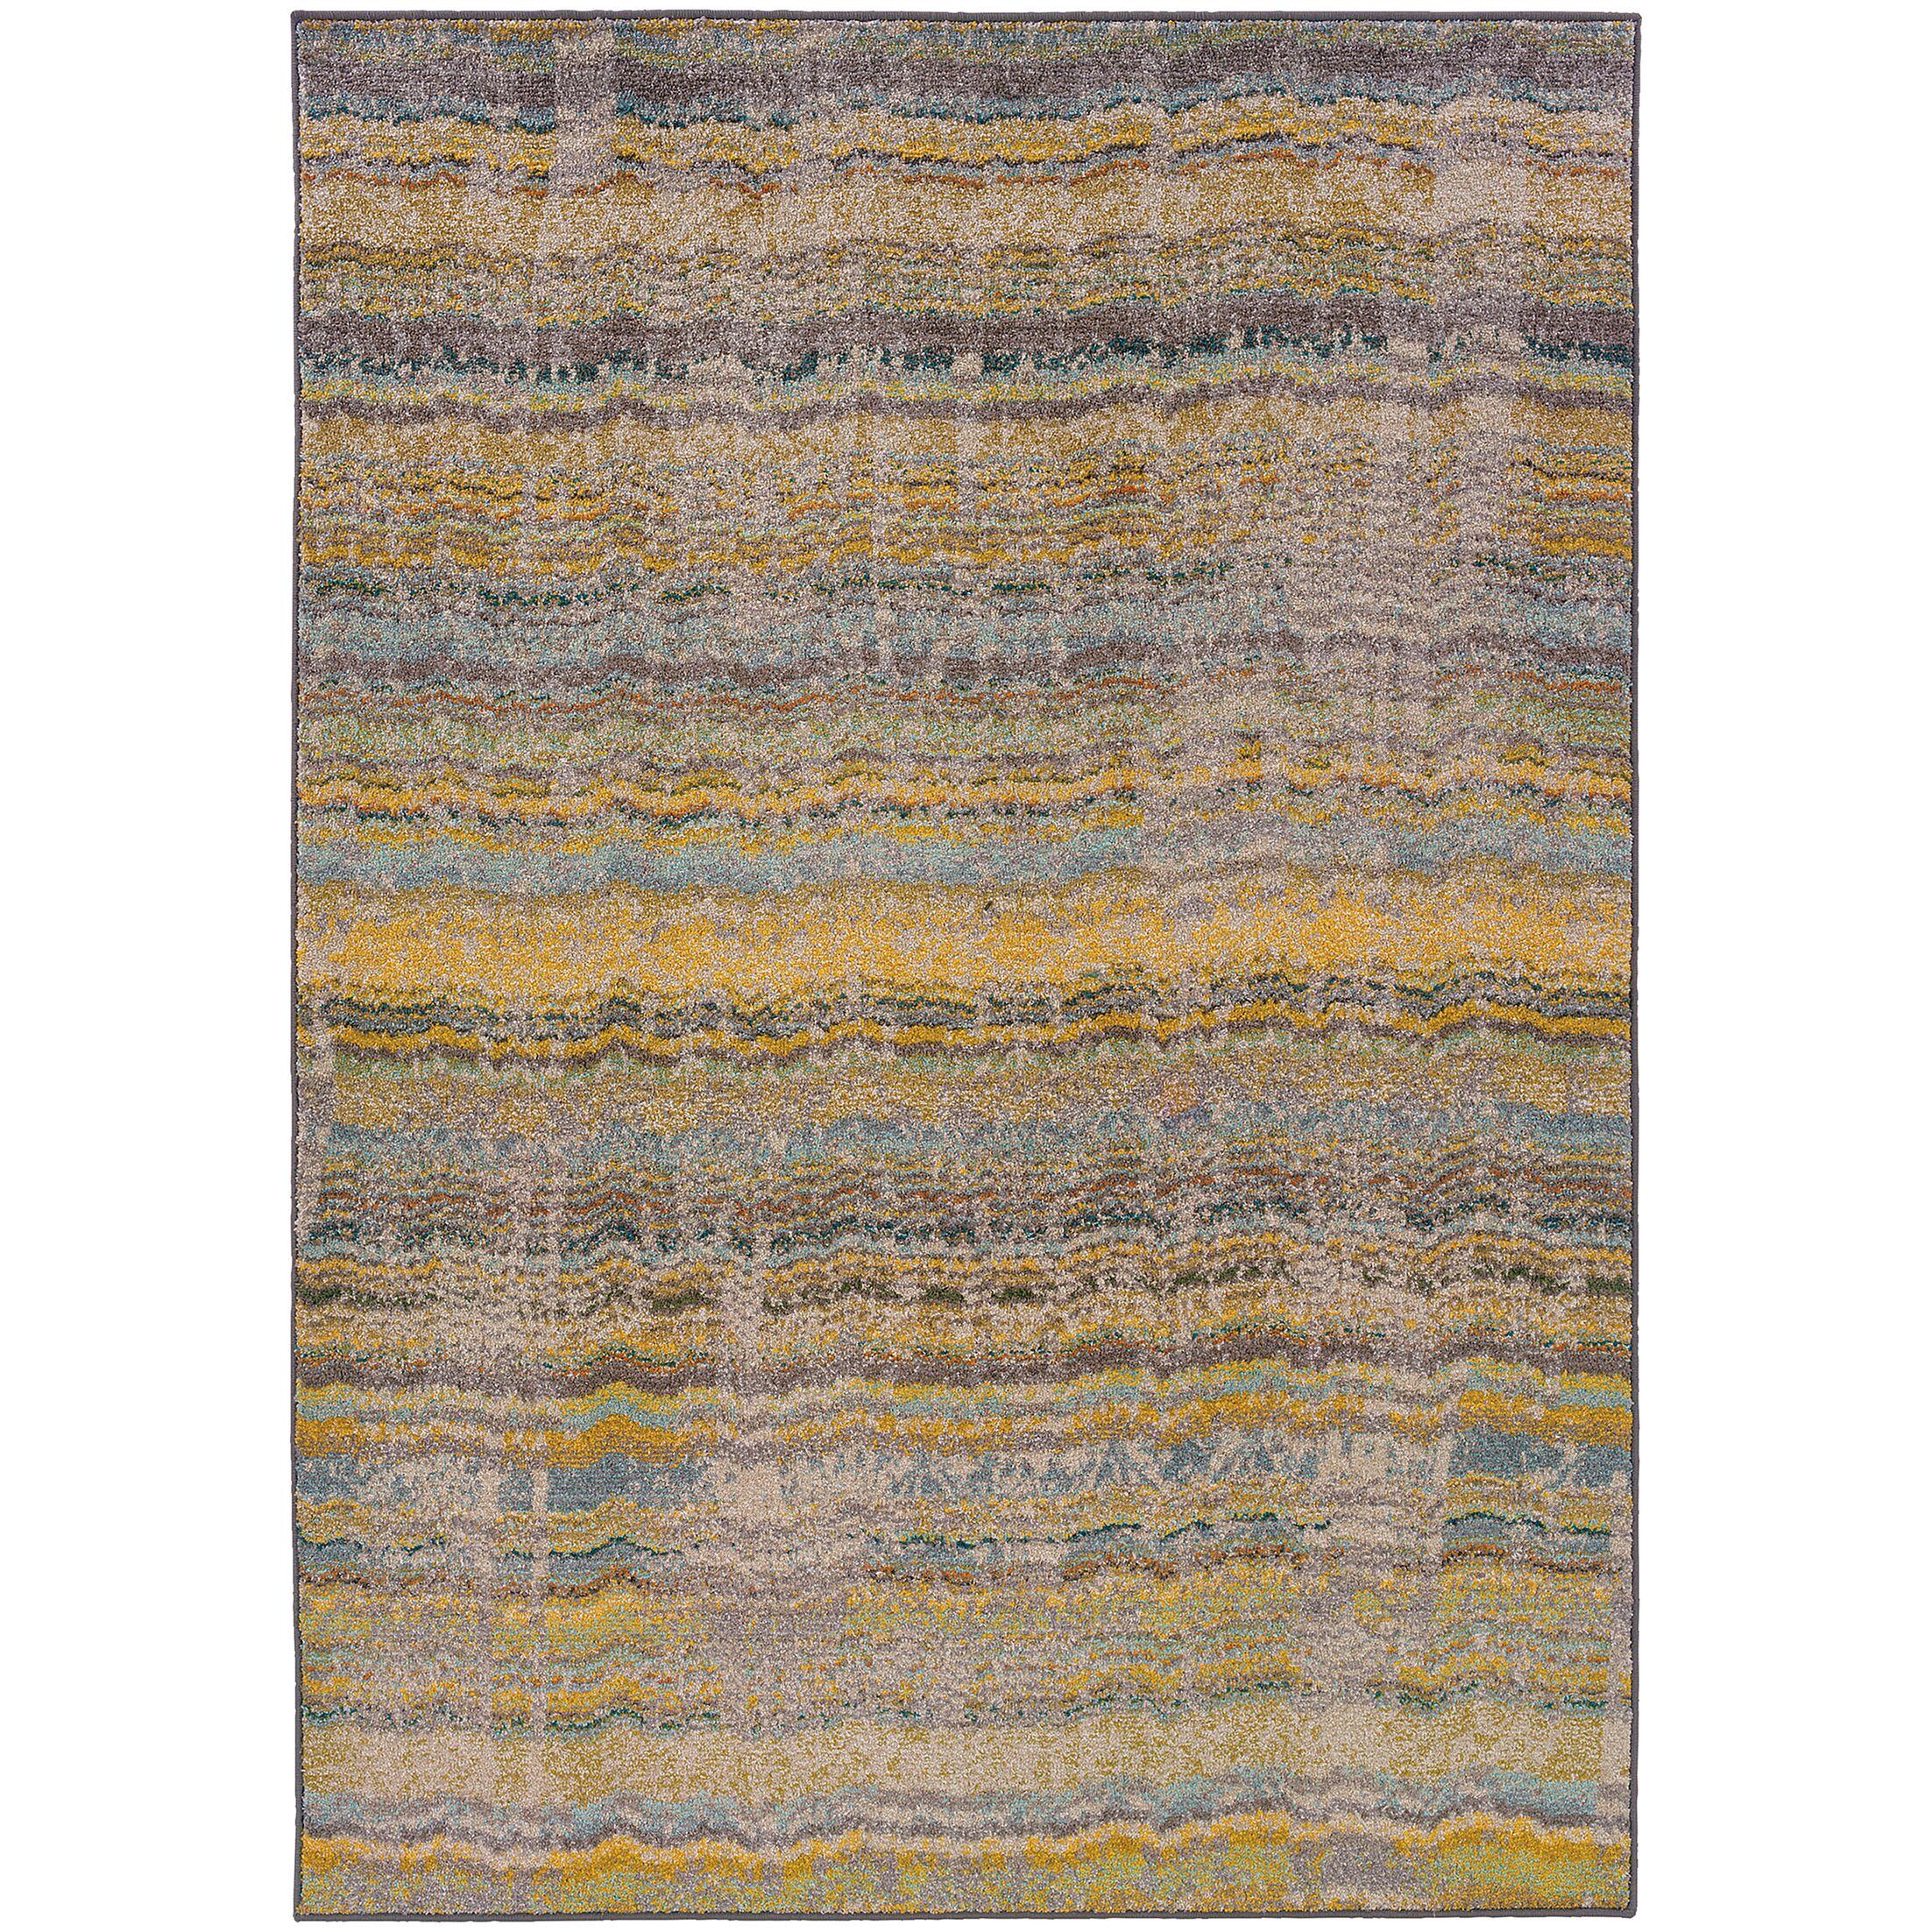 Alcaraz Distressed Stripe Yellow/Gray Area Rug Rug Size: Rectangle 7'10